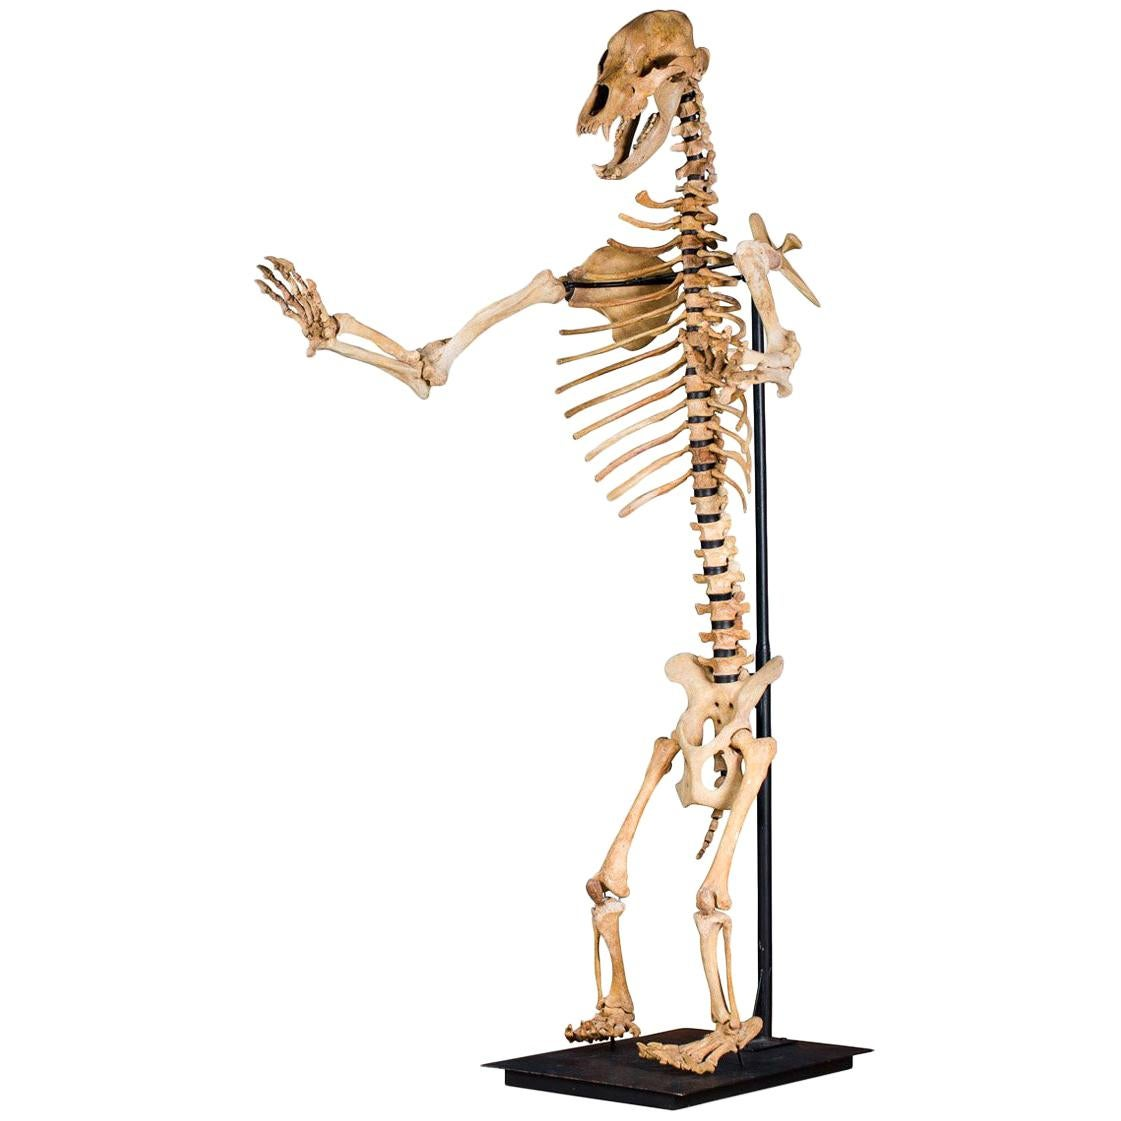 Cave Bear Skeleton from the Pleistocene Era